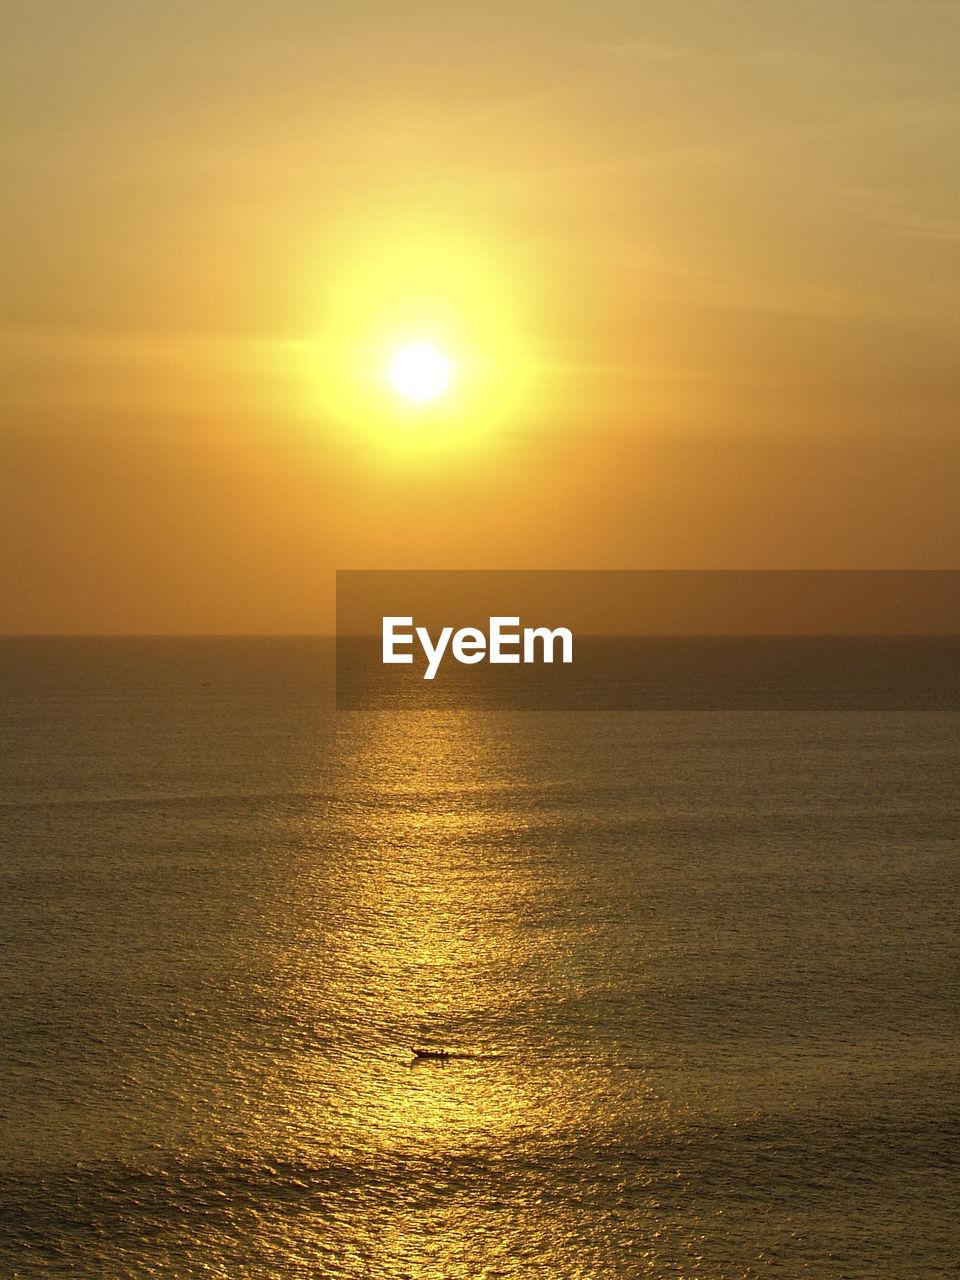 sky, sunset, water, scenics - nature, sea, beauty in nature, sun, horizon over water, horizon, tranquility, tranquil scene, sunlight, waterfront, orange color, idyllic, reflection, nature, non-urban scene, no people, outdoors